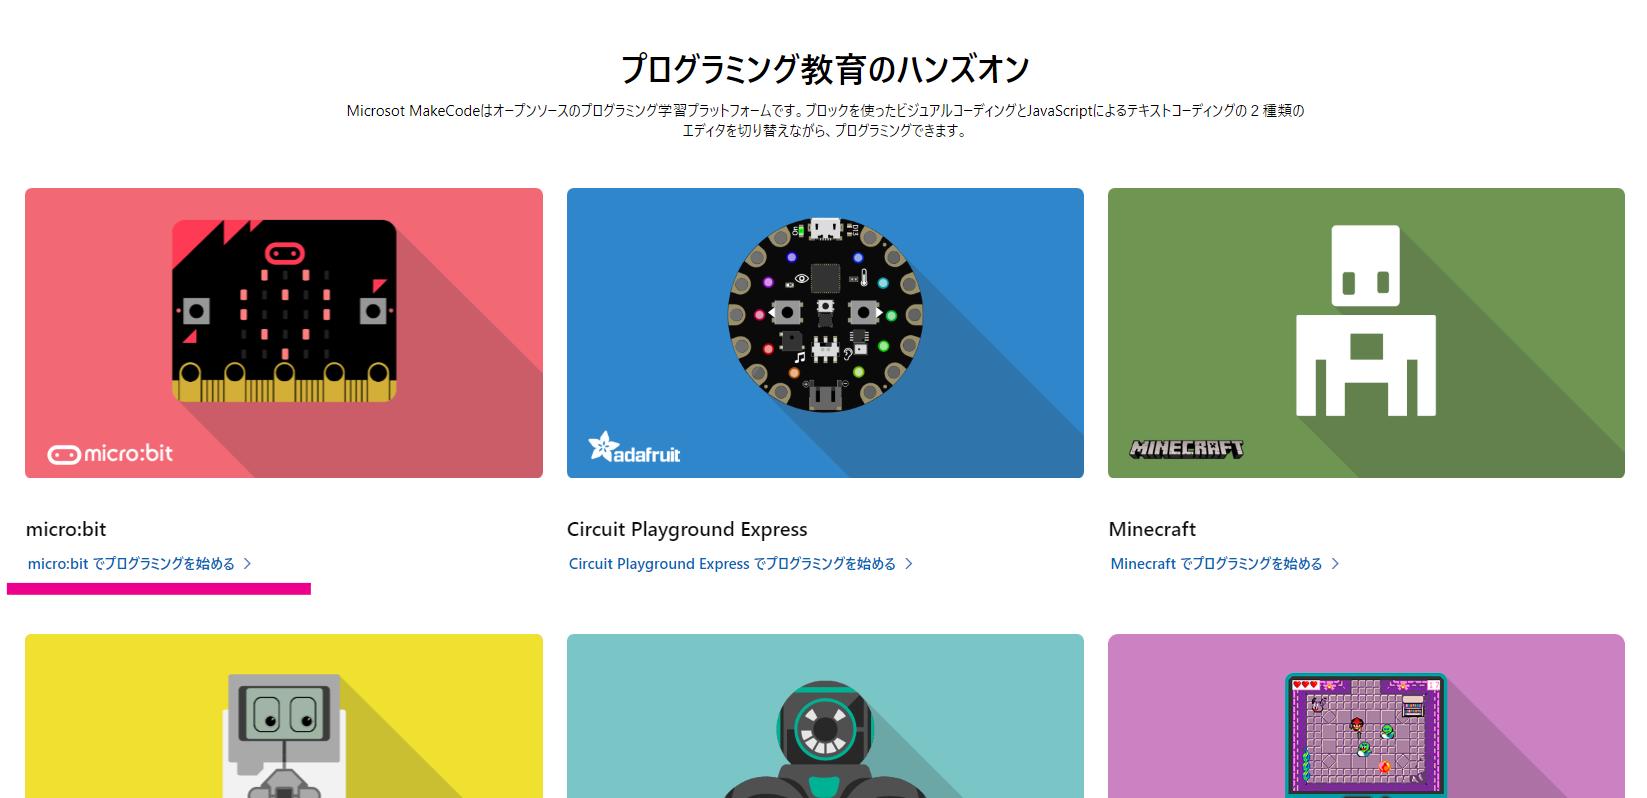 Microsoft MakeCodeのサイトでmicro:bitを選択しましょう